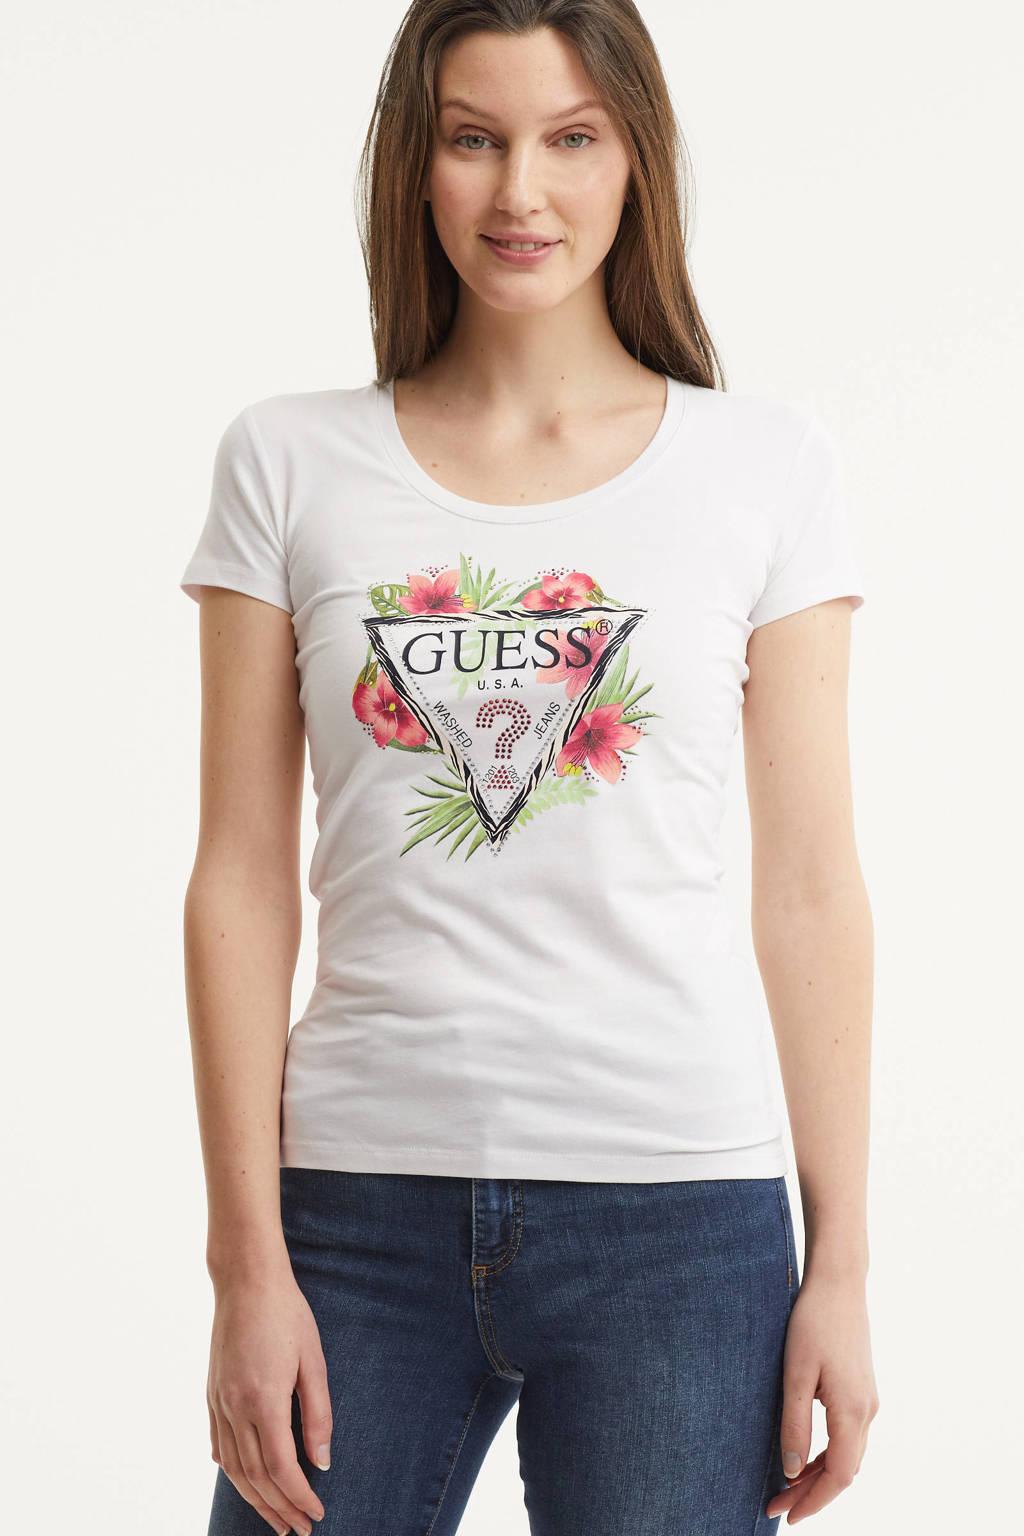 GUESS T-shirt met printopdruk wit, Wit